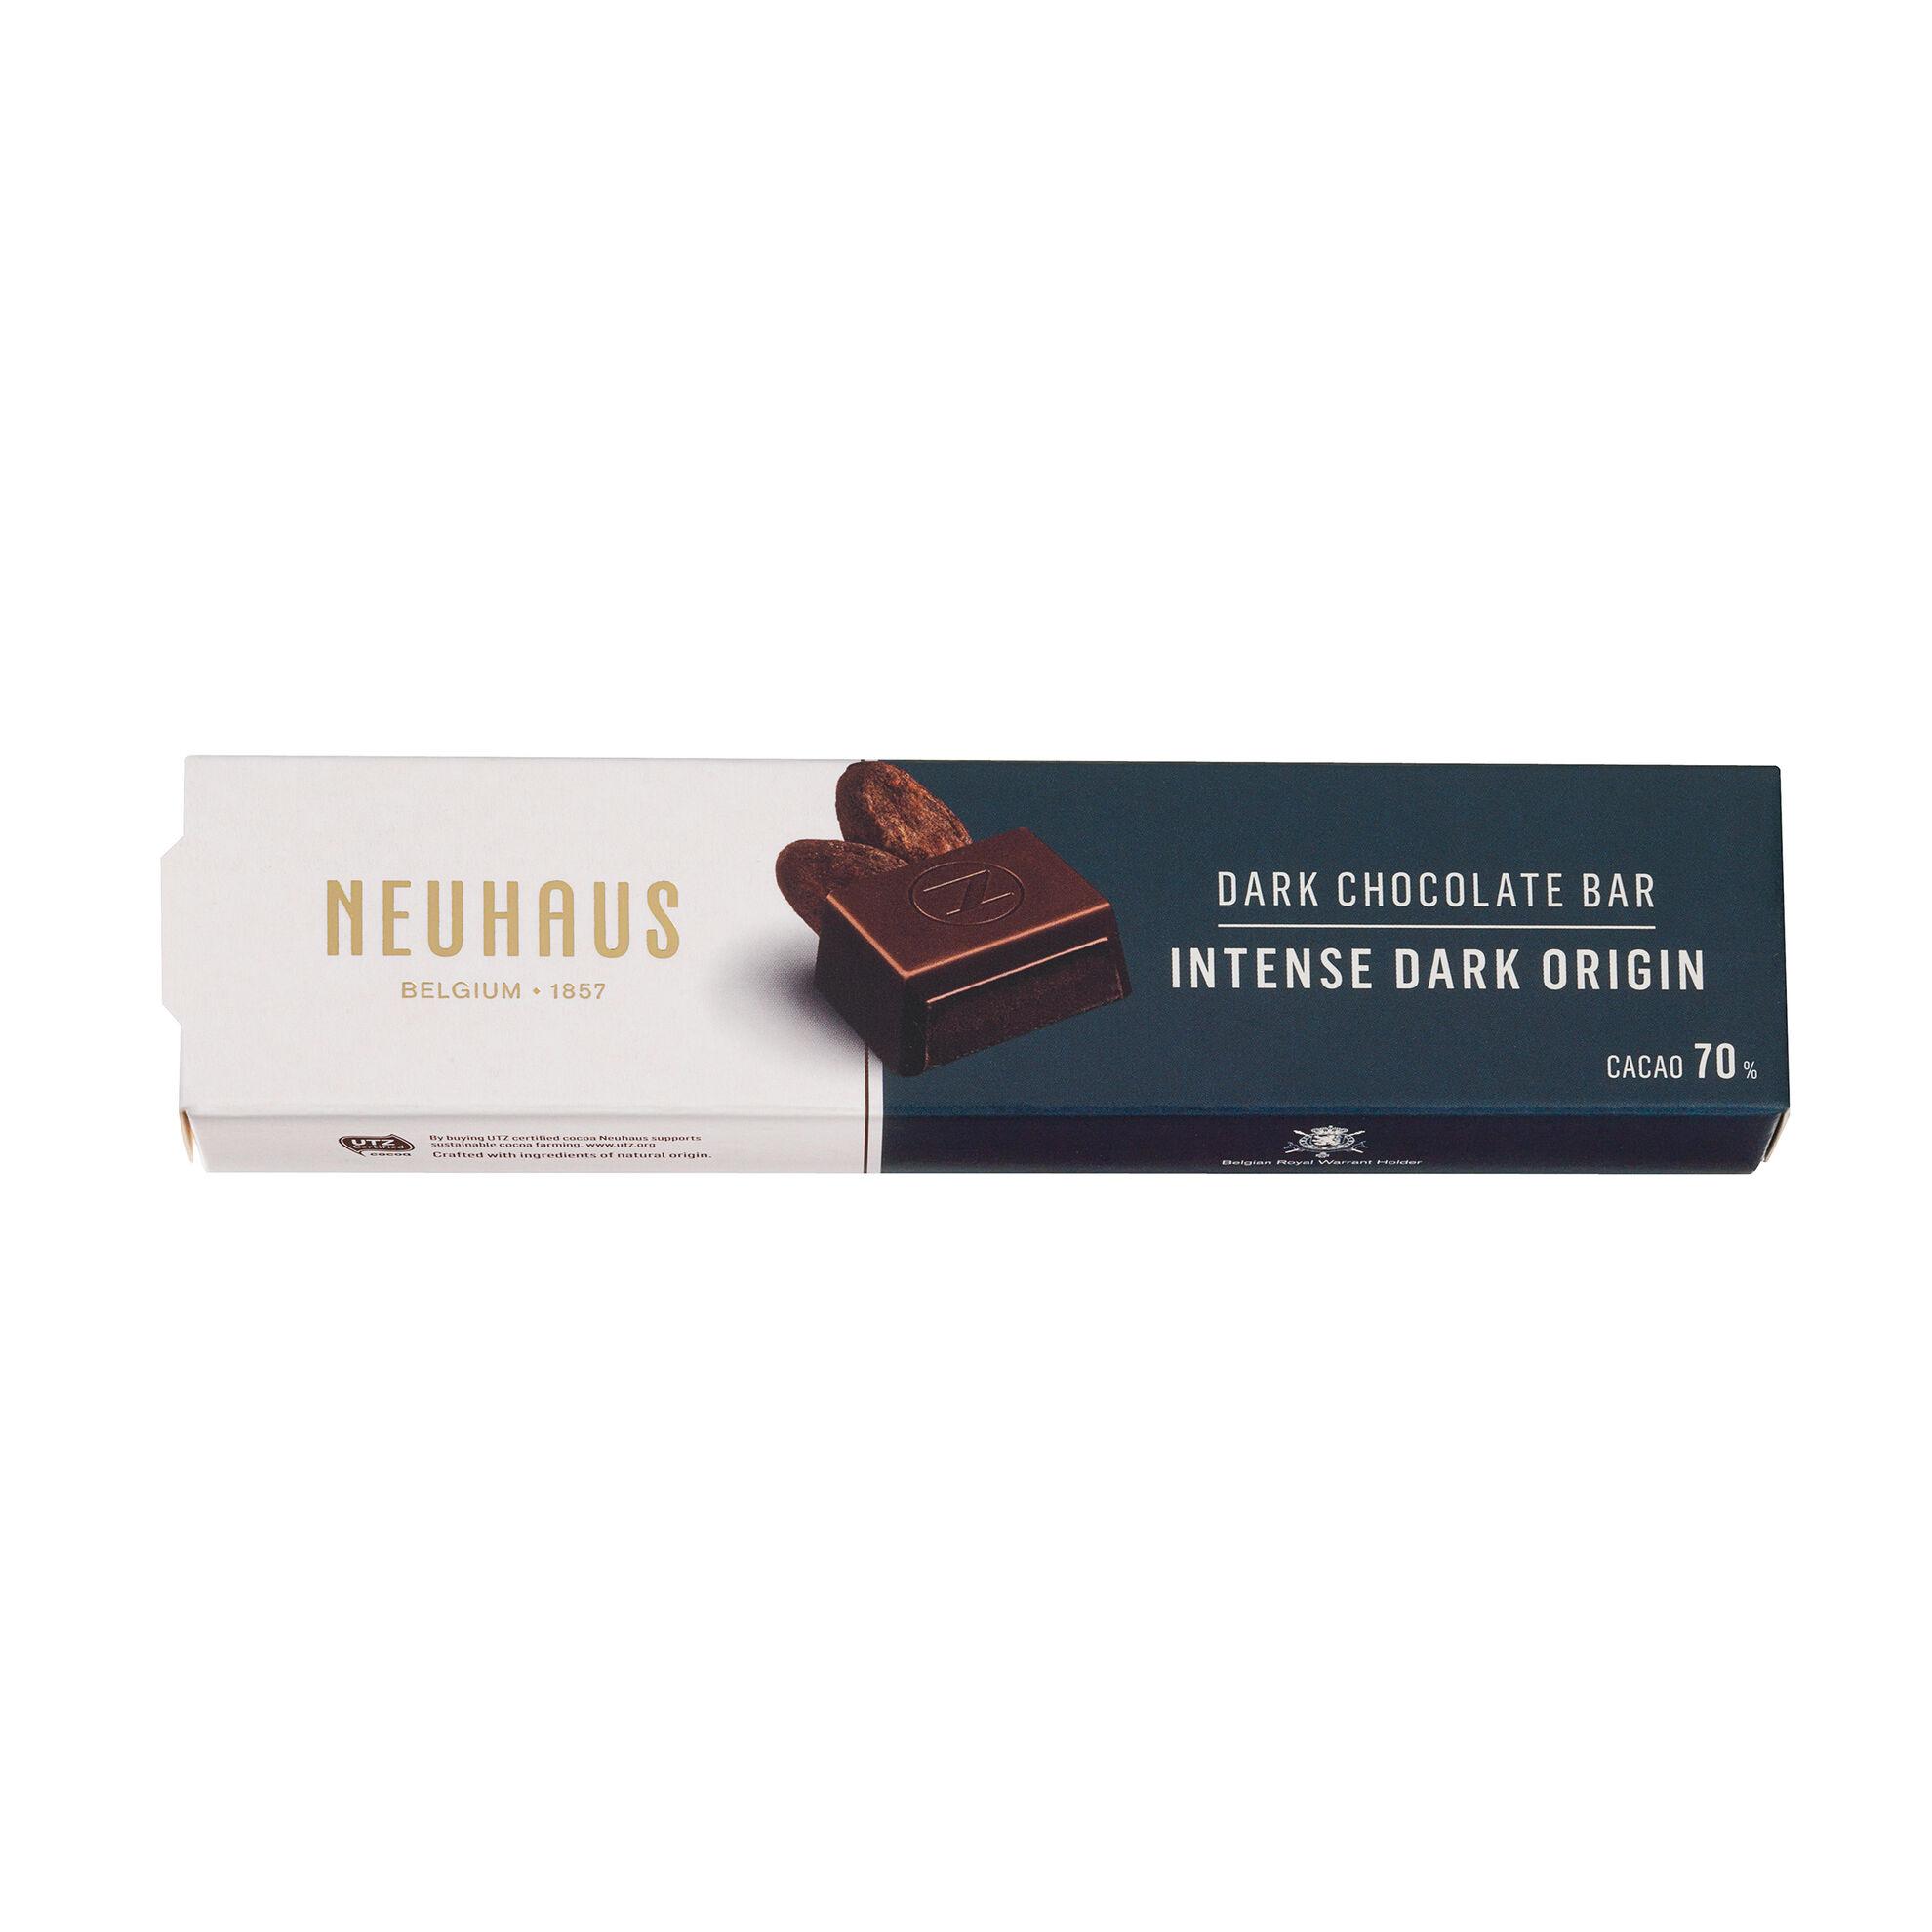 Dark Chocolate Bar - Intense Dark Origin image number 11